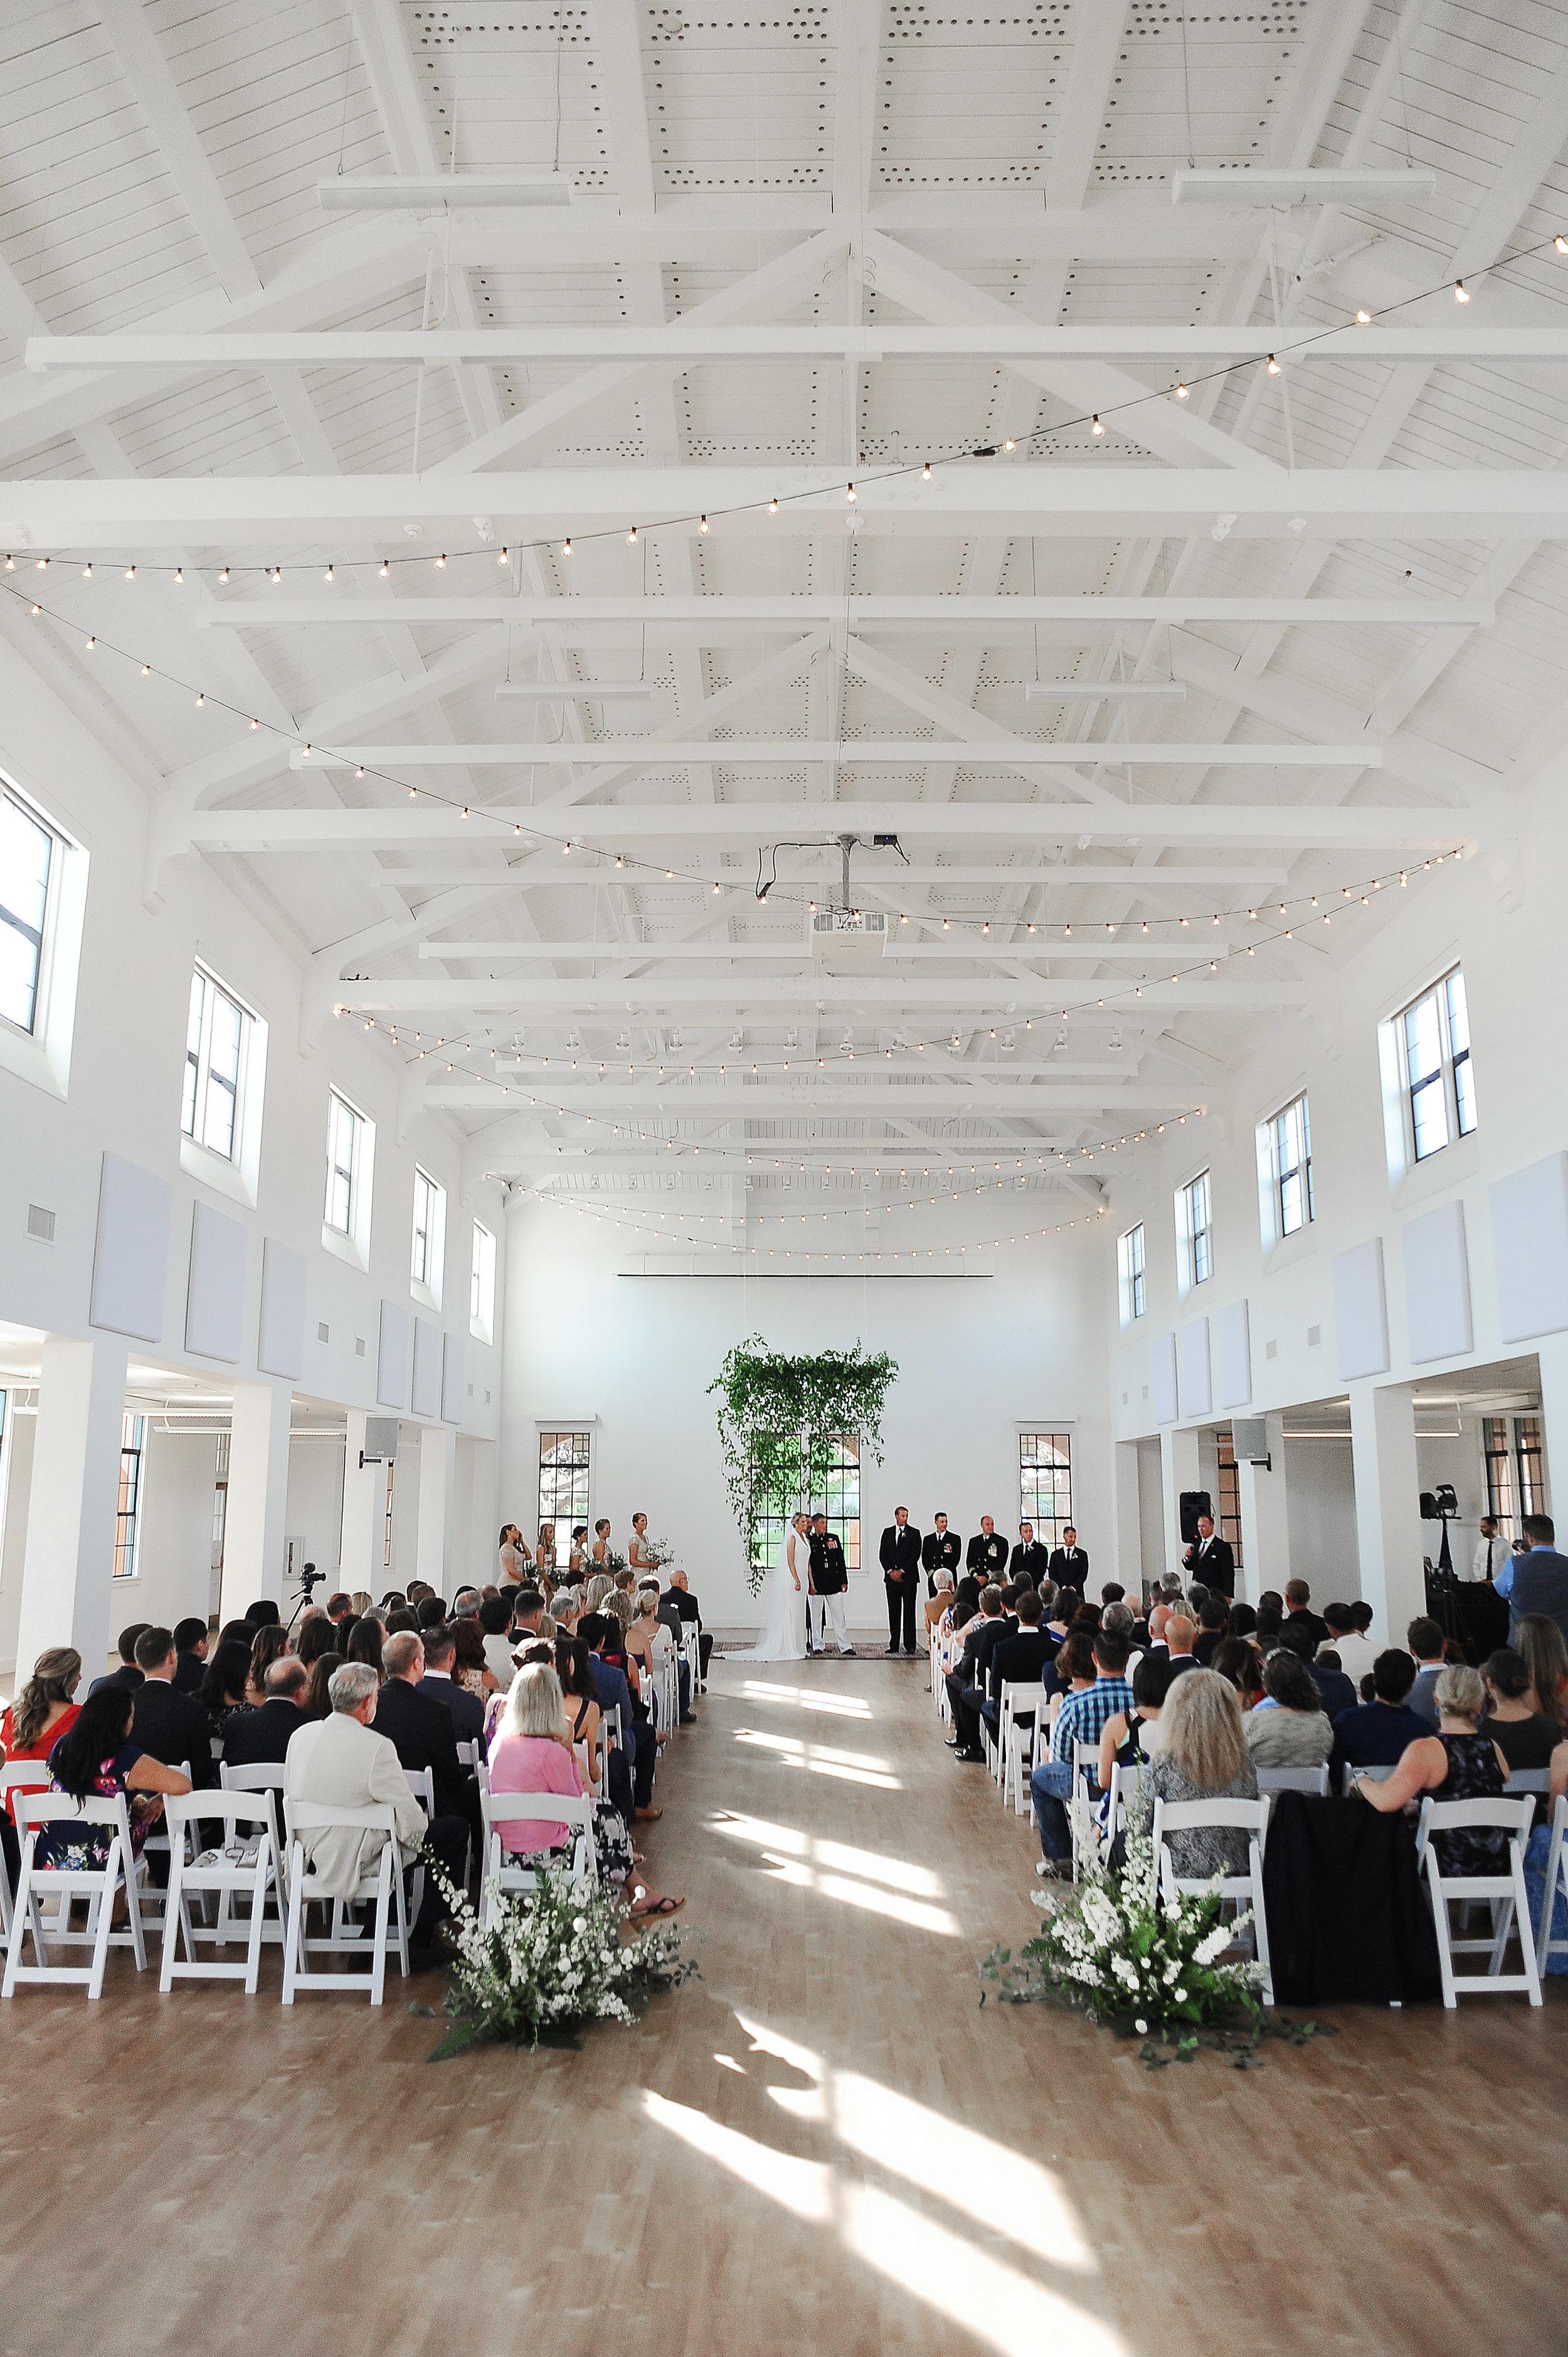 Bldg-177-wedding-ceremony-jessicafreyphotography.jpg